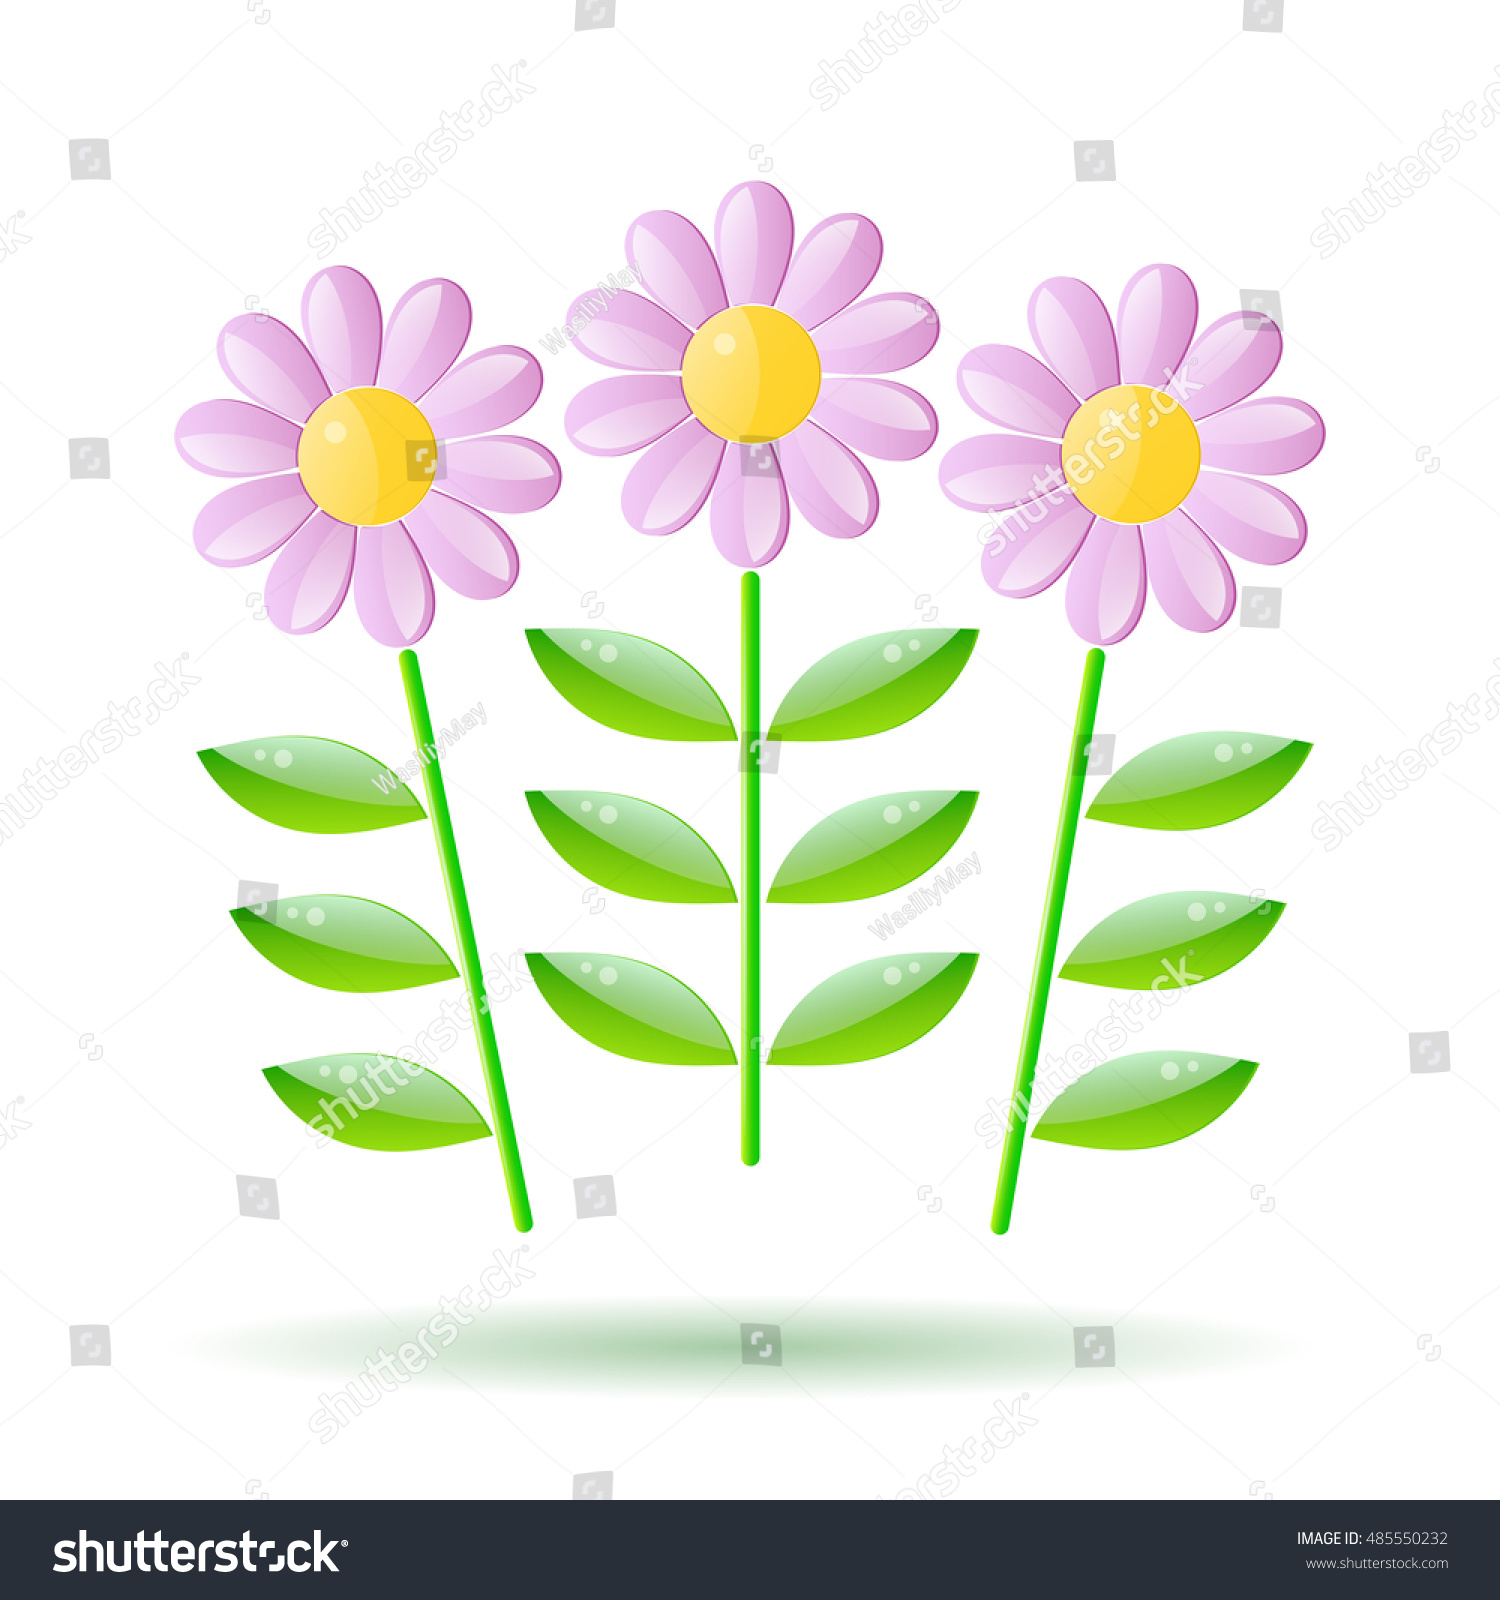 Vector Cartoon Bouquet Of Glass Flowers With A Stem Ez Canvas